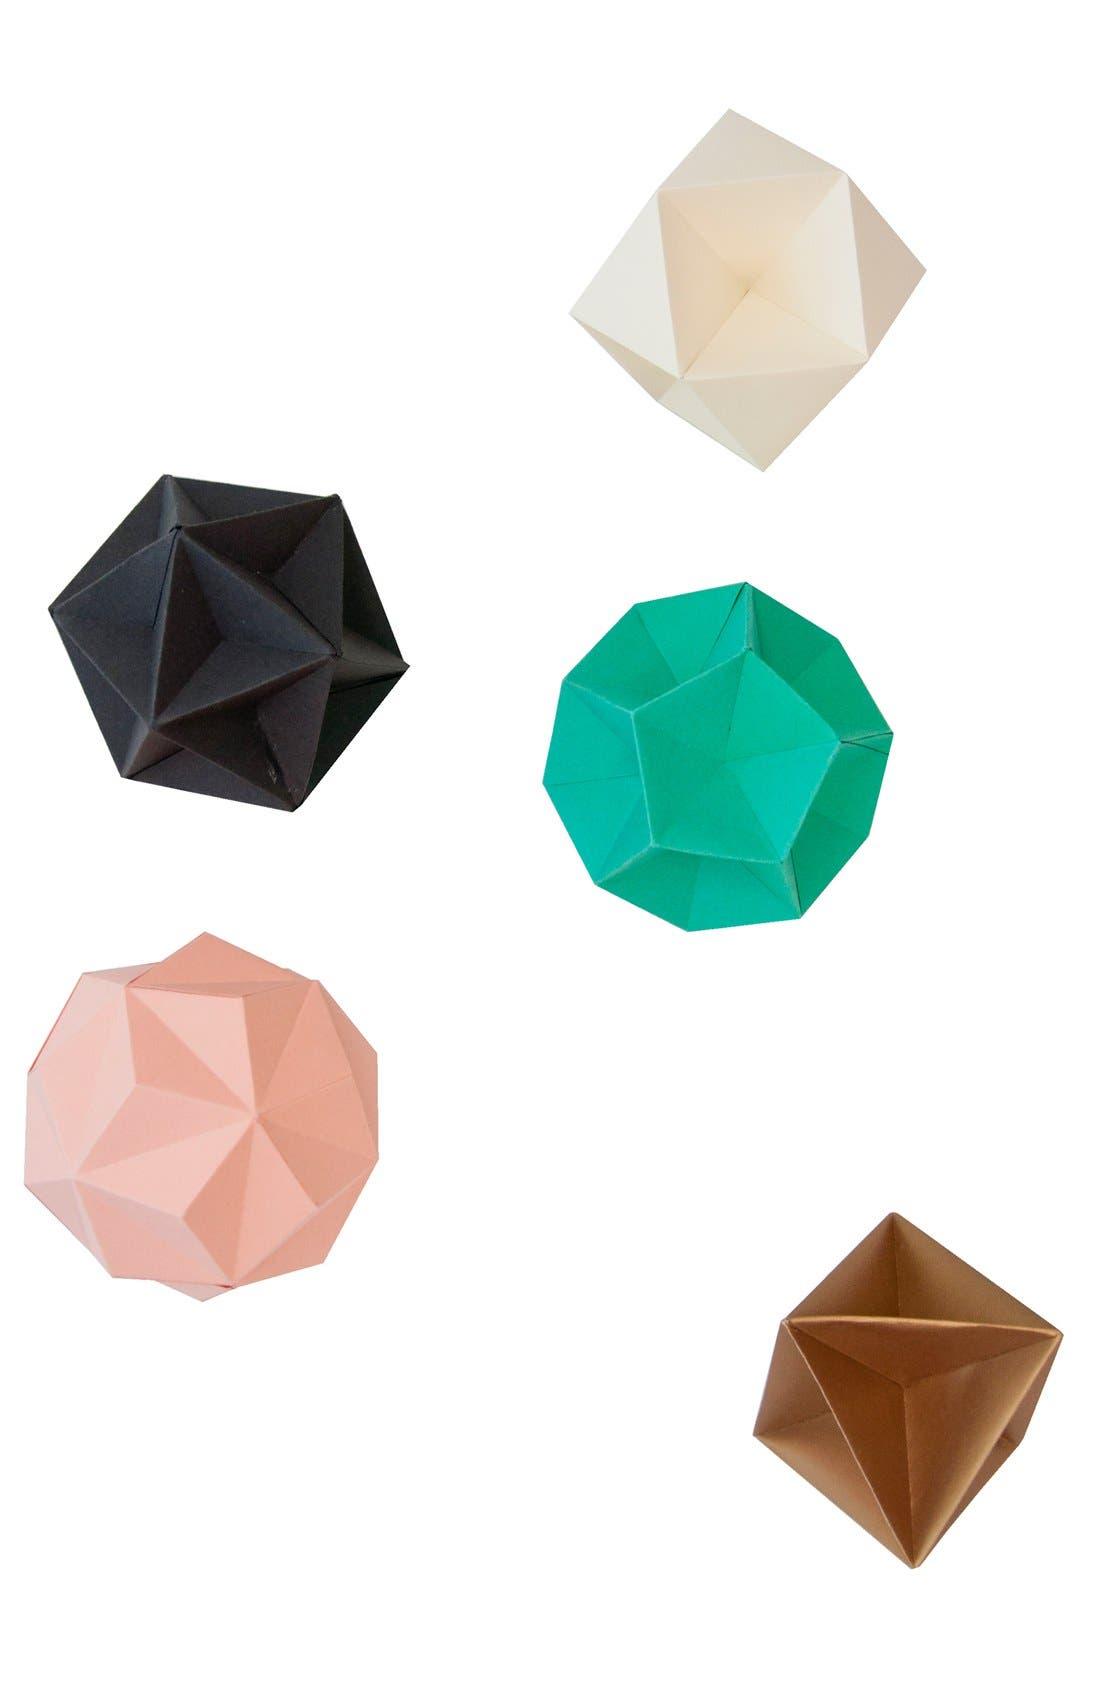 ARTECNICA,                              'Themis Prism' Mobile,                             Alternate thumbnail 6, color,                             101